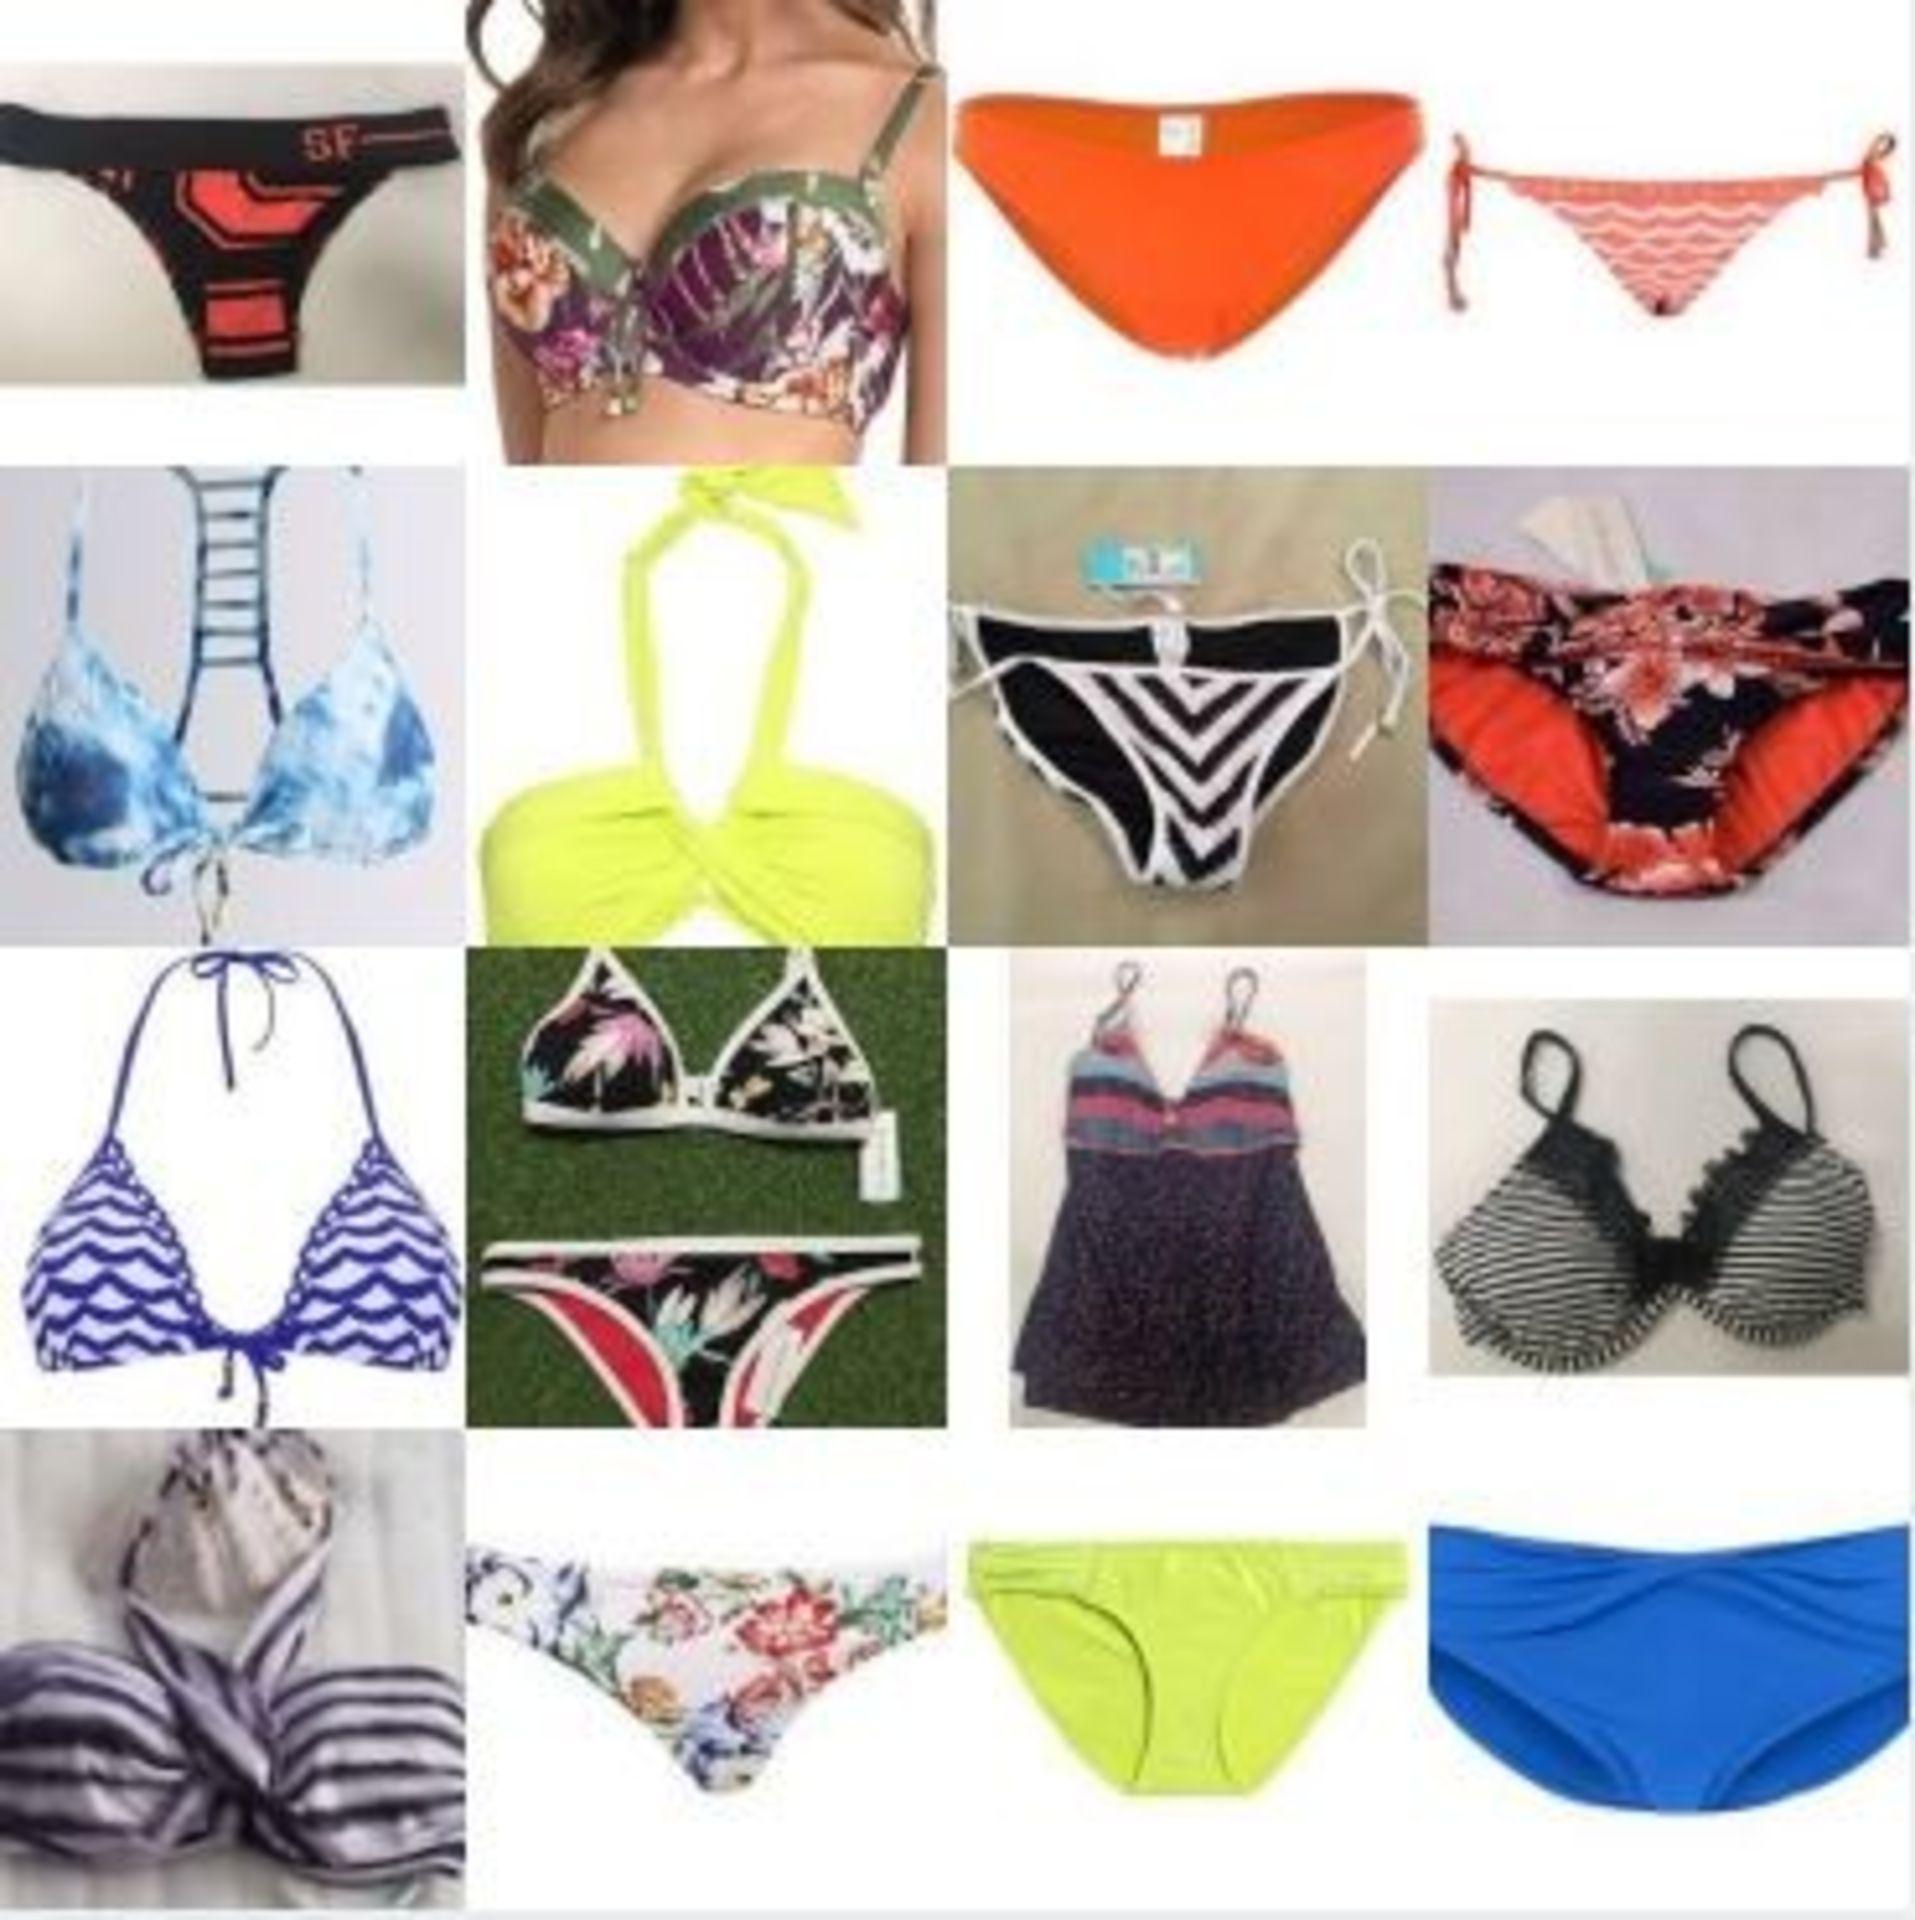 Lot 46 - Sourced From Big Brand Bikini Manufacturer SeaFolly: